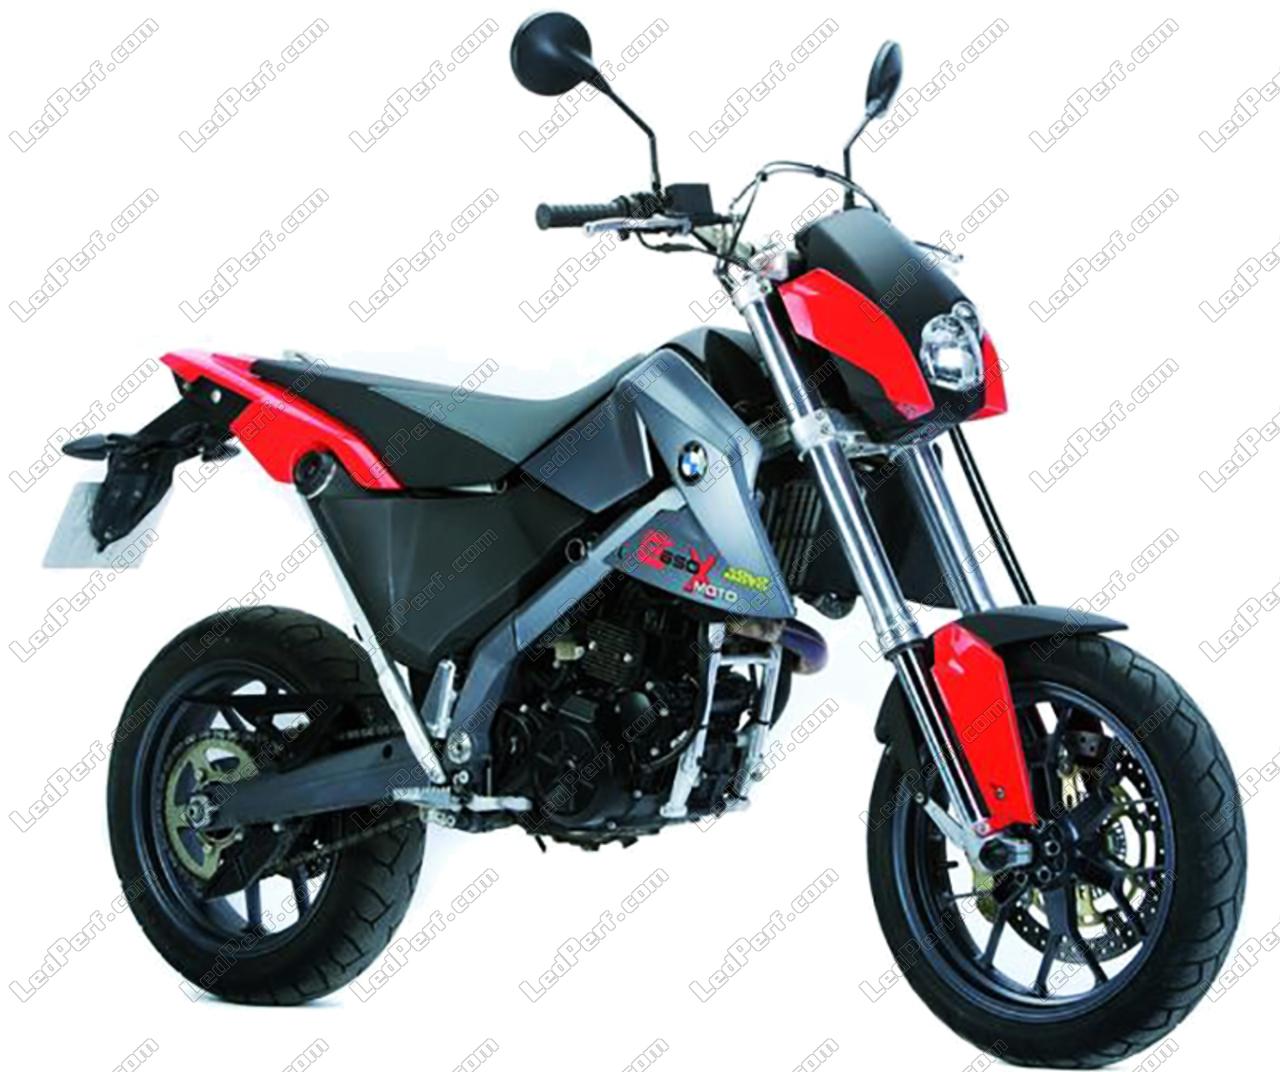 Bmw Motorrad G 650 Xmoto Canbus Bi Xenon Hid Conversion